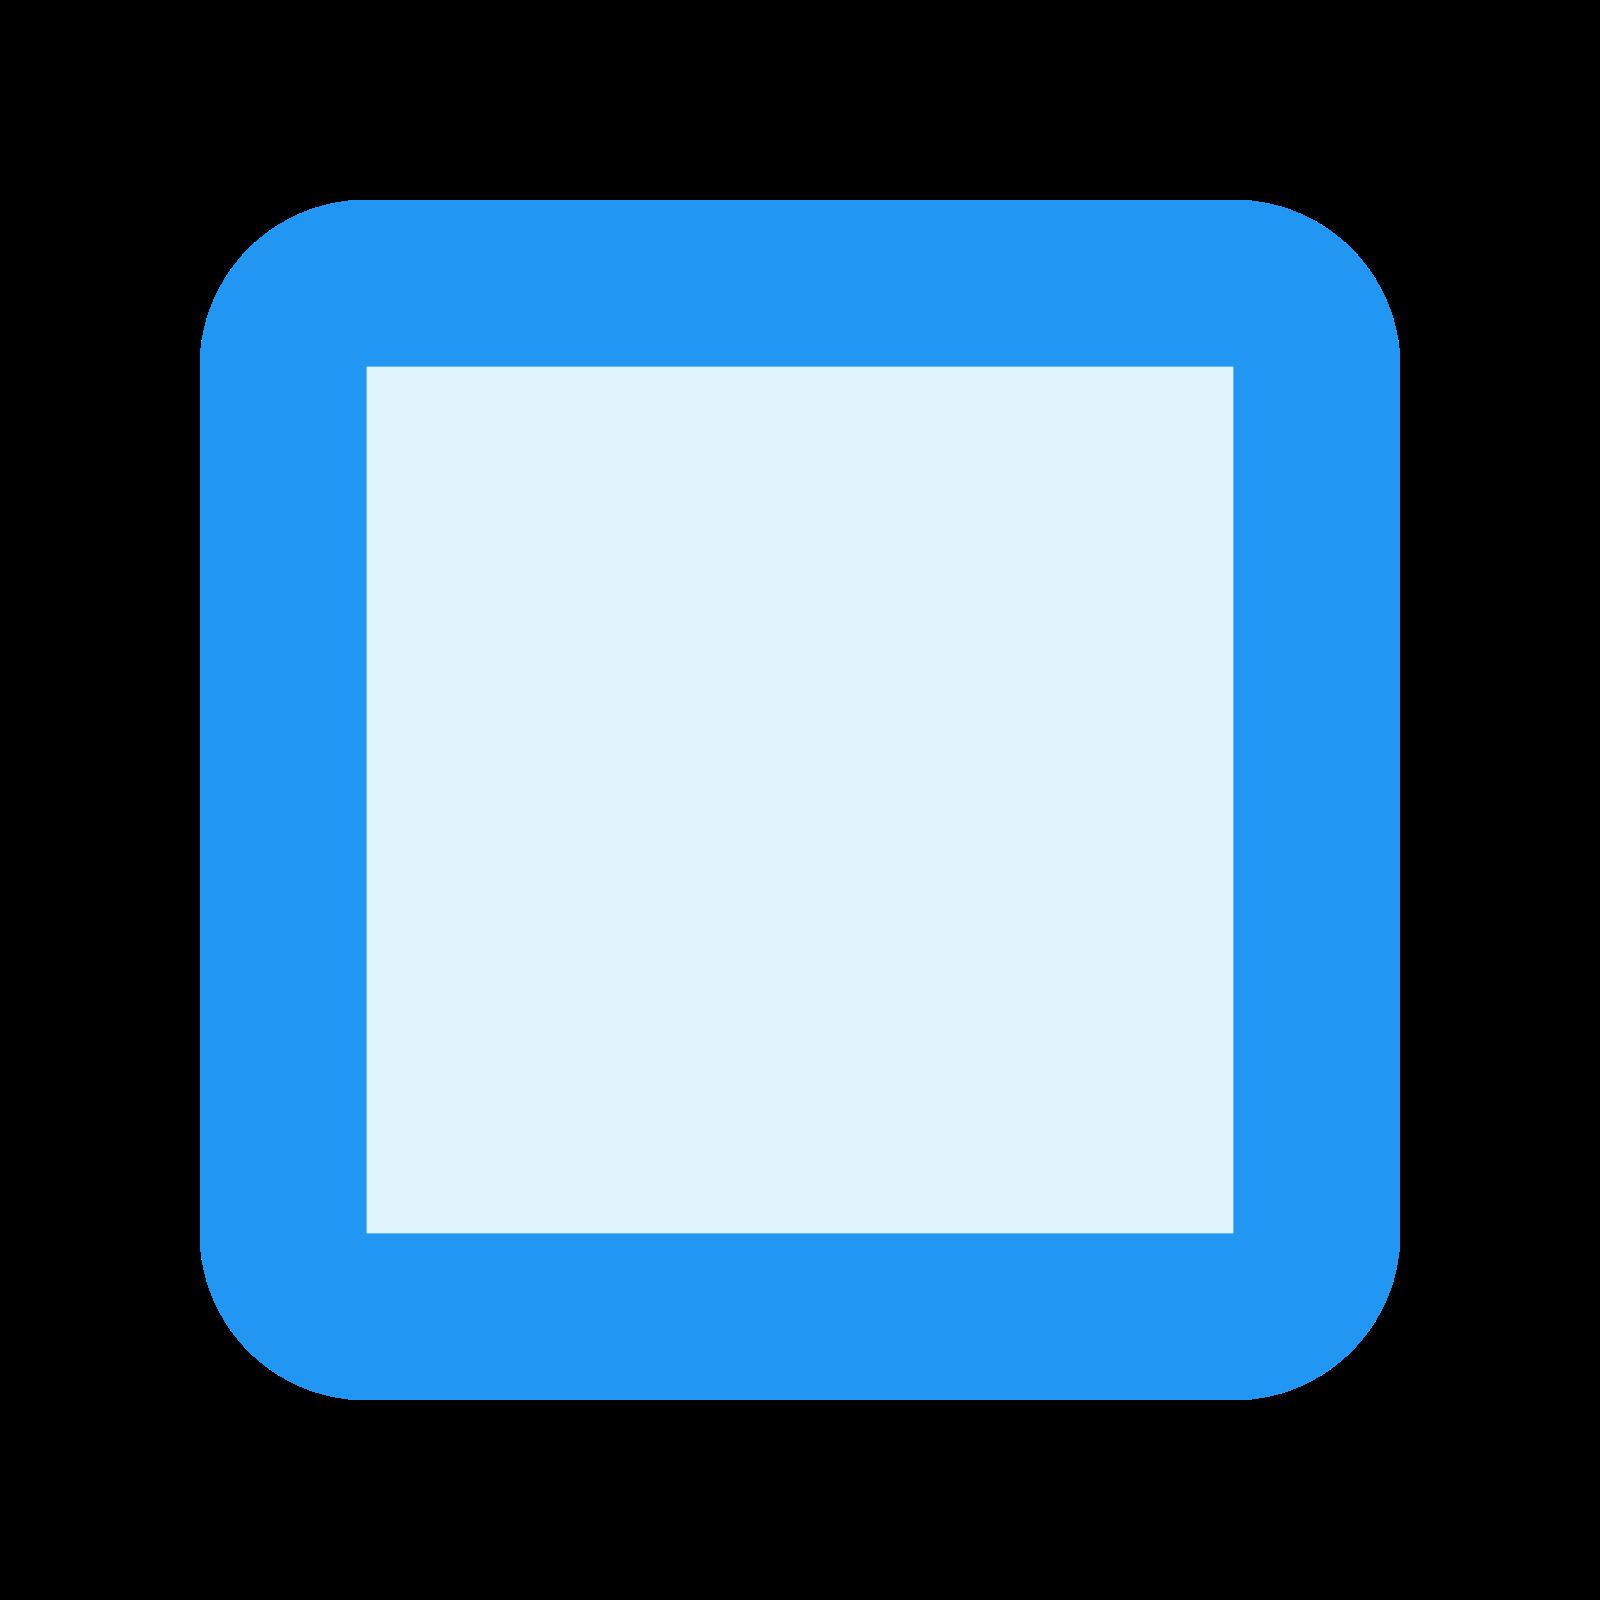 Unchecked Checkbox icon